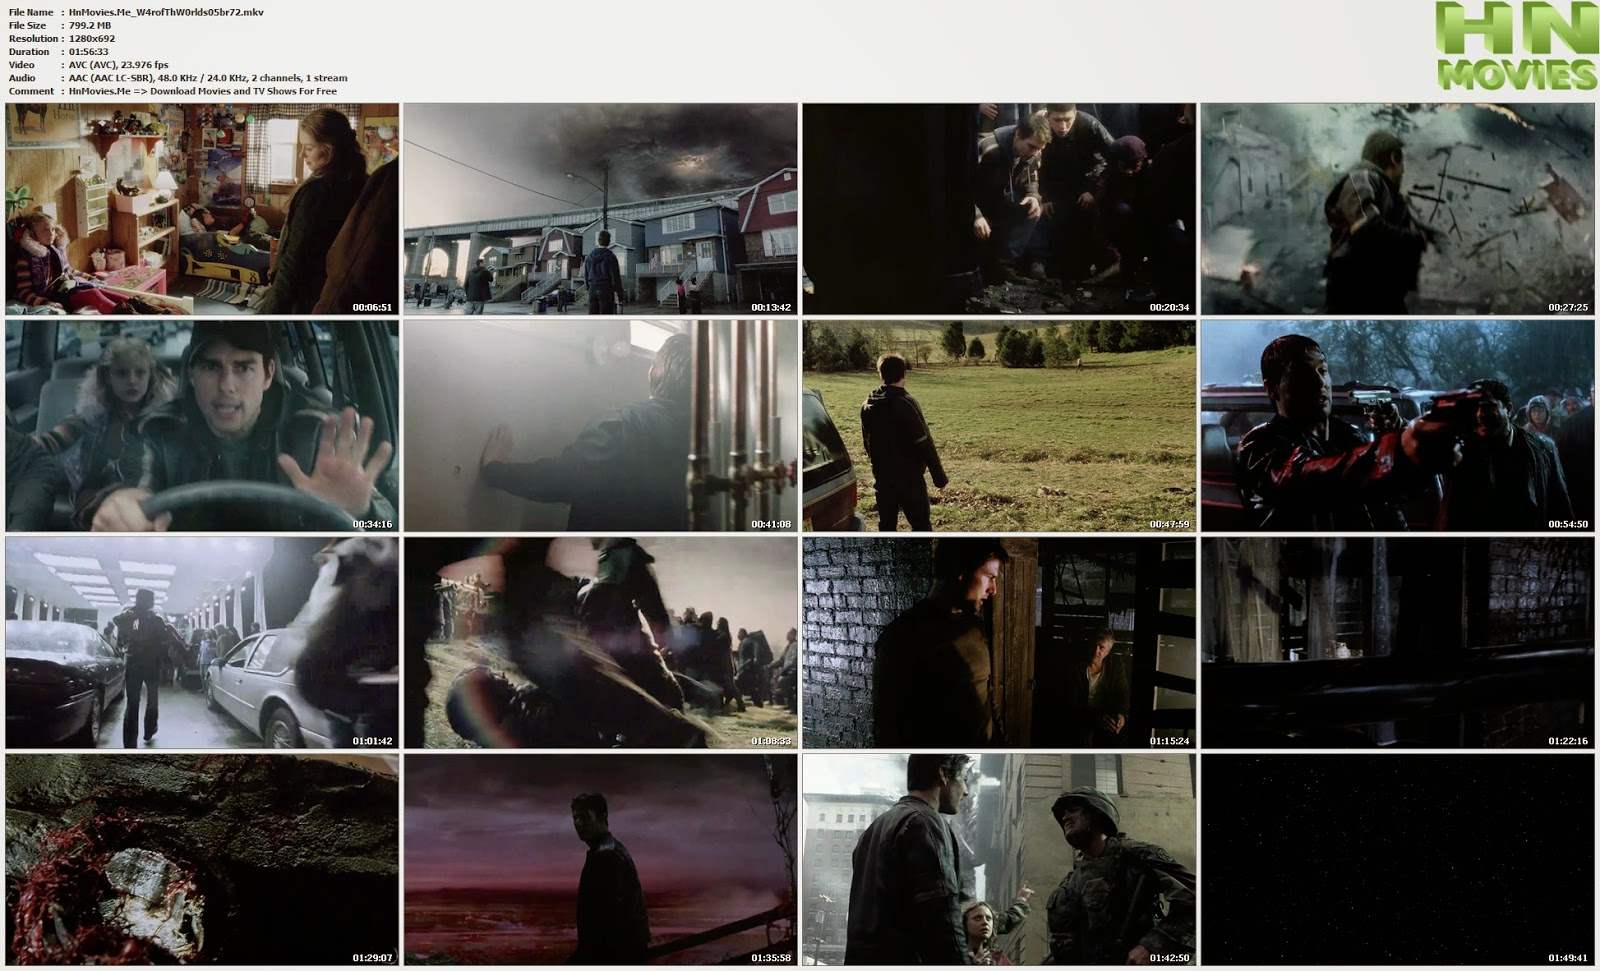 movie screenshot of War of the Worlds fdmovie.com